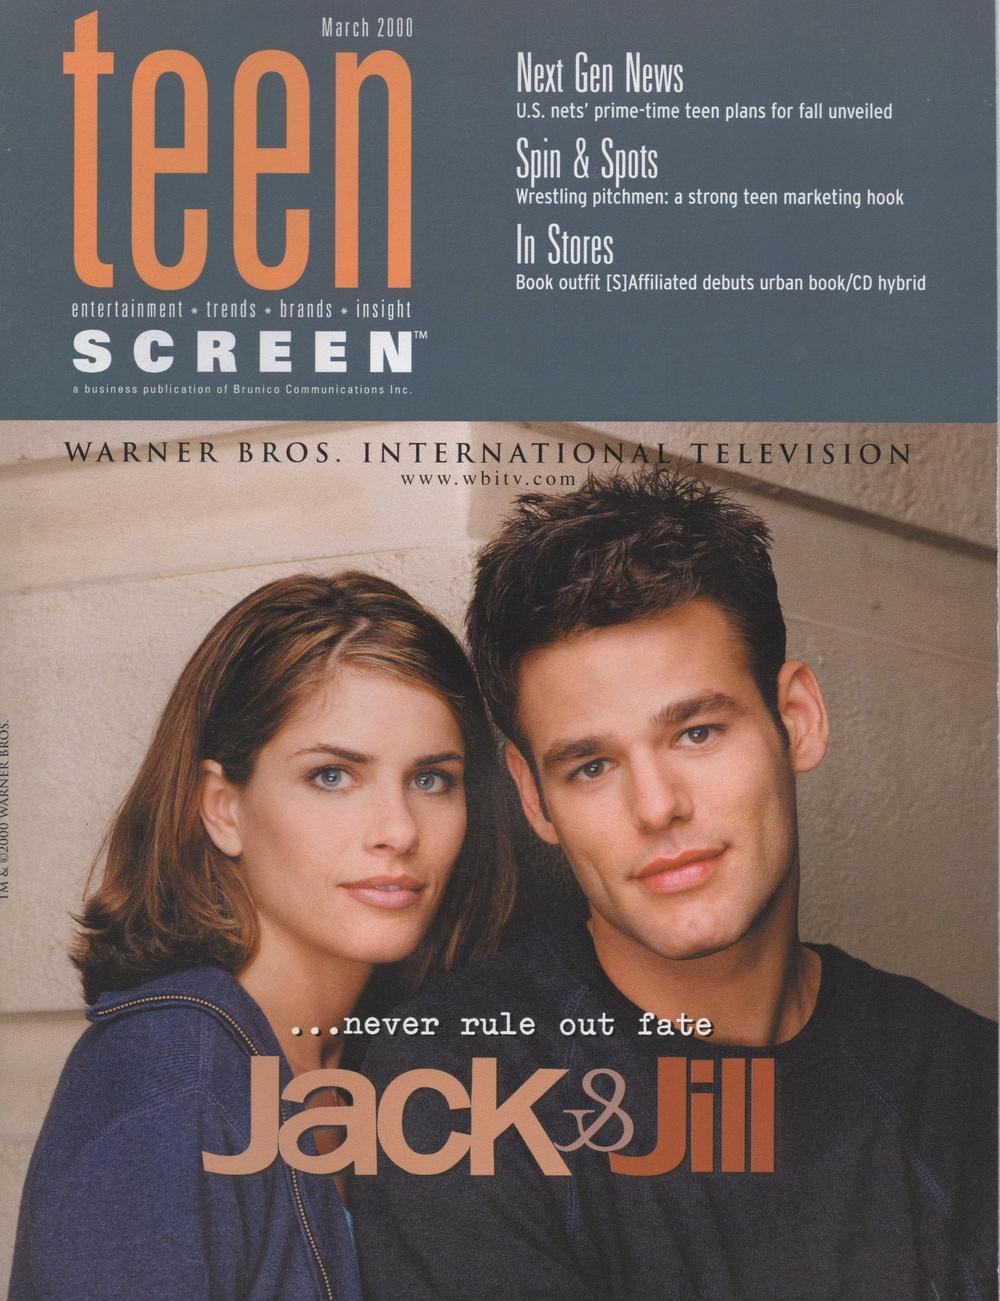 Teenscreen magazine